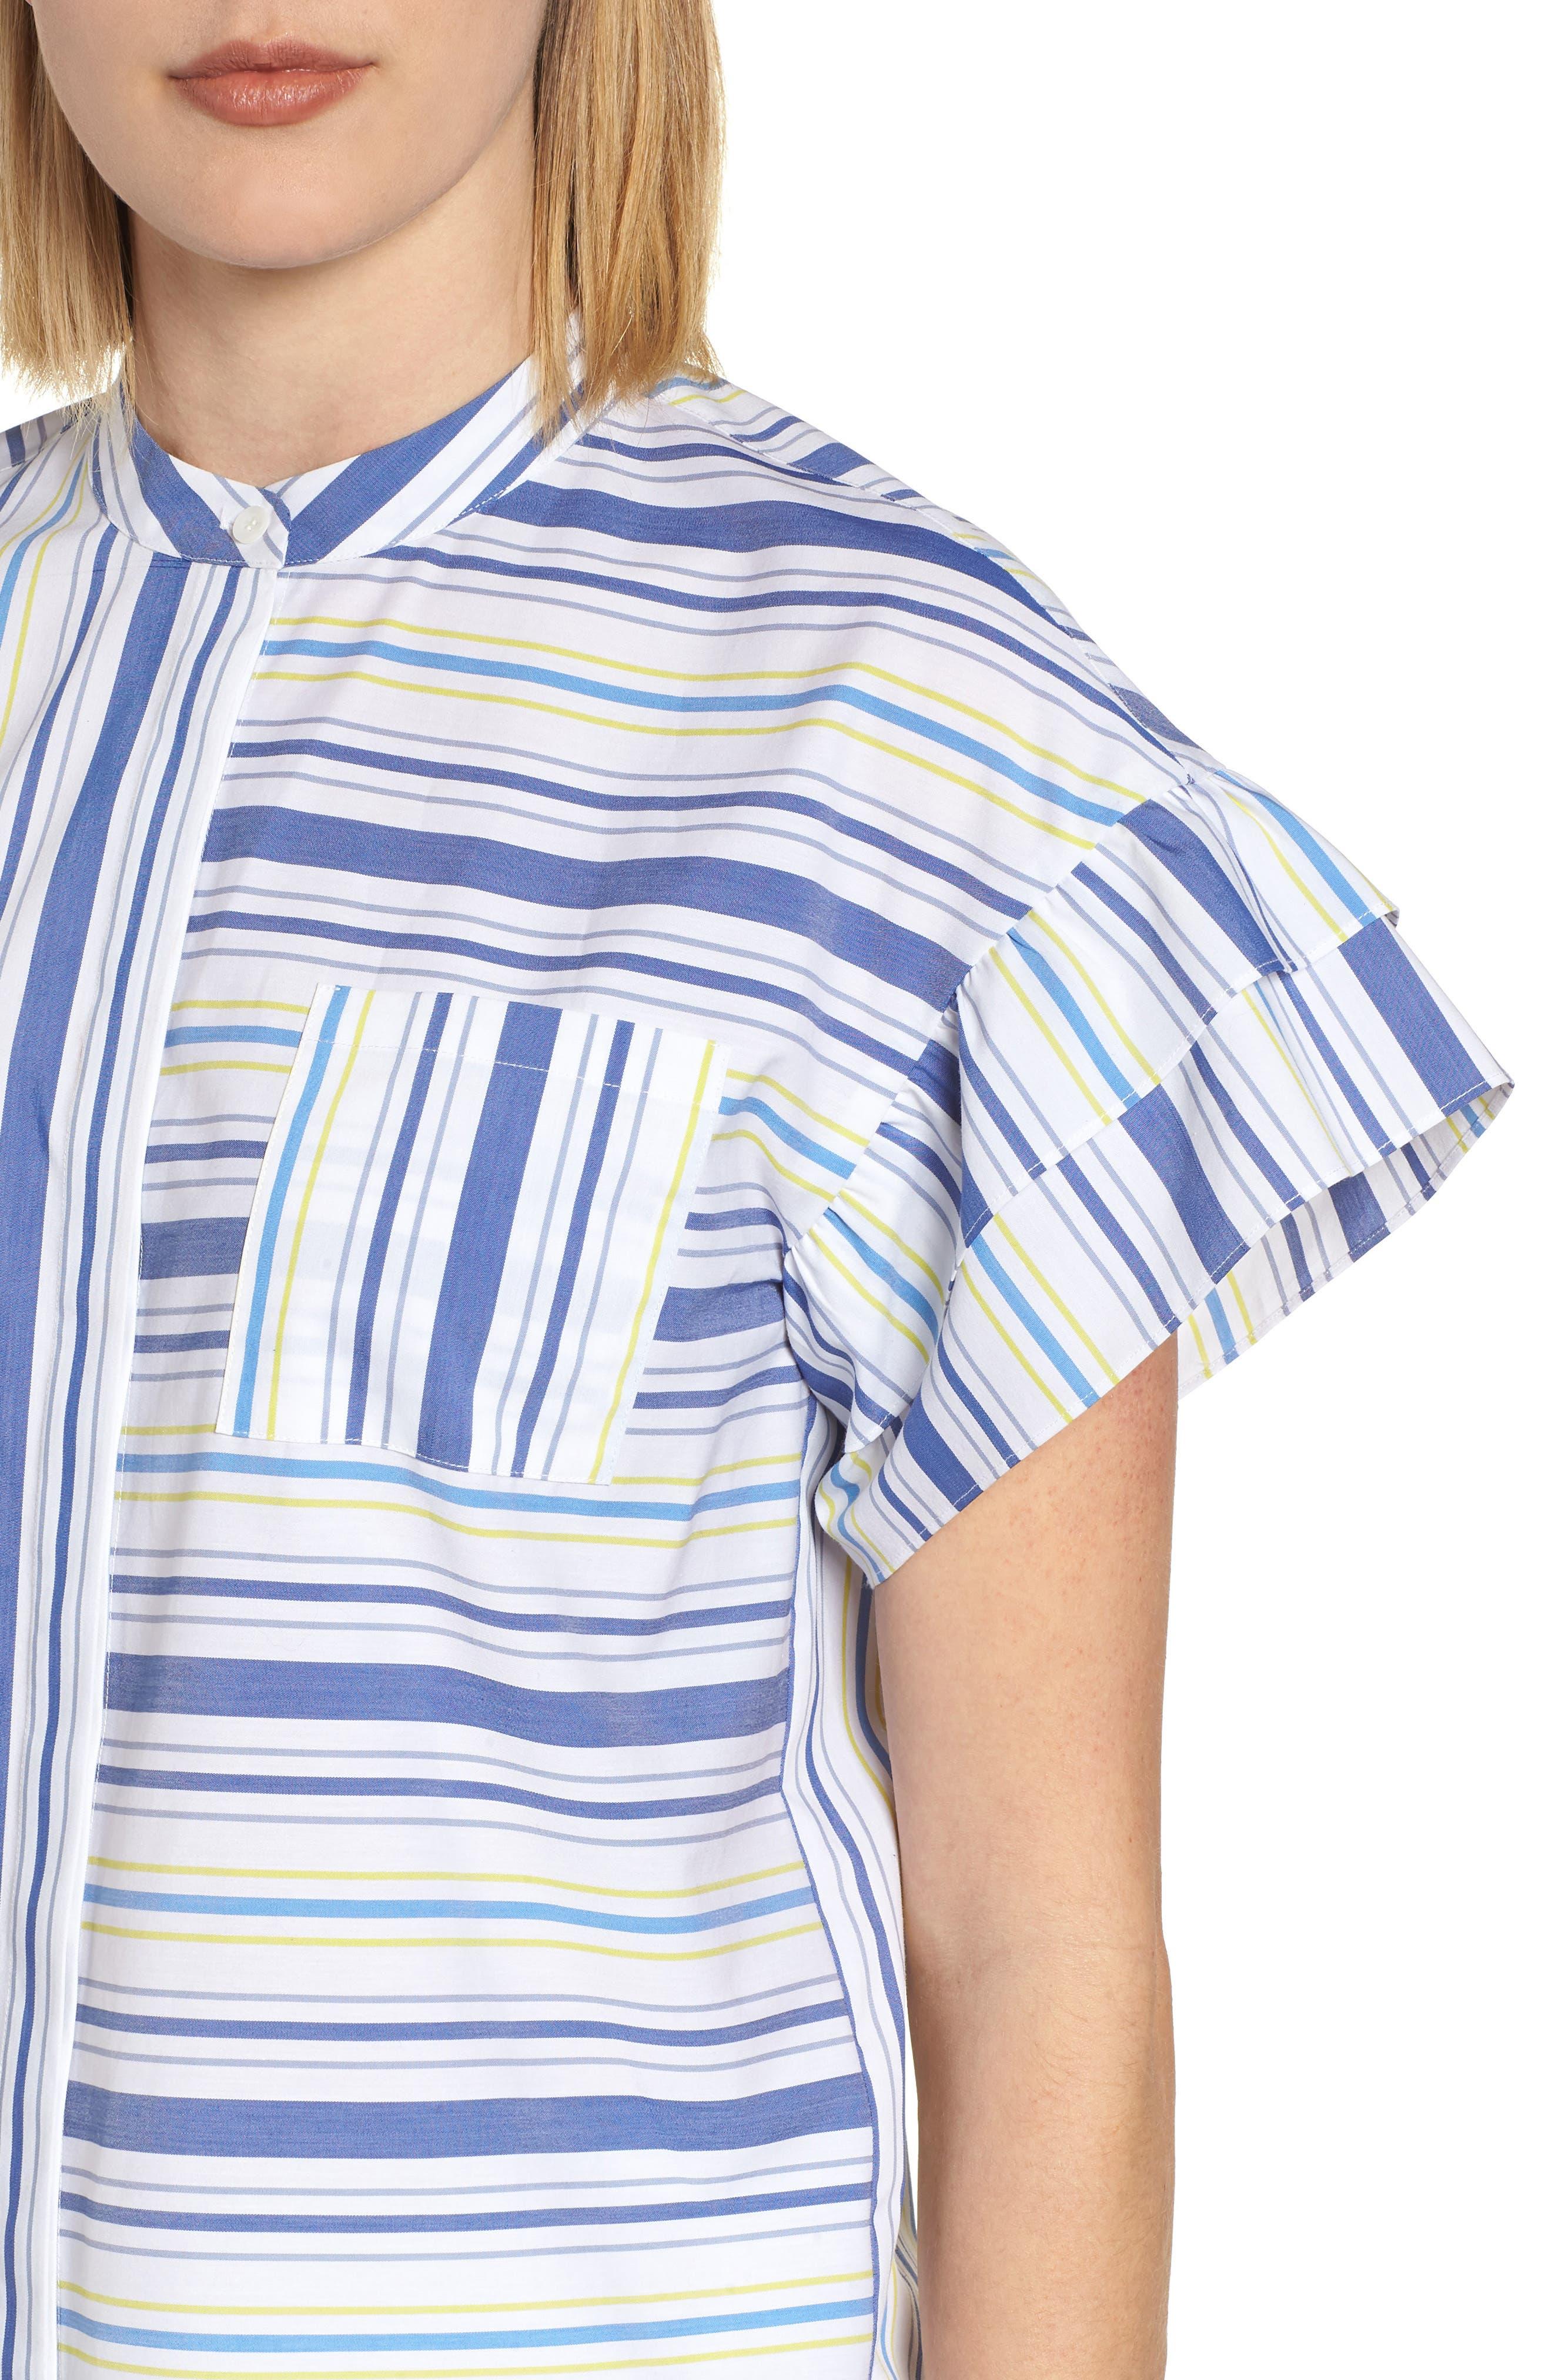 Ruffle Sleeve Stretch Cotton Blend Blouse,                             Alternate thumbnail 4, color,                             White Multi Stripe